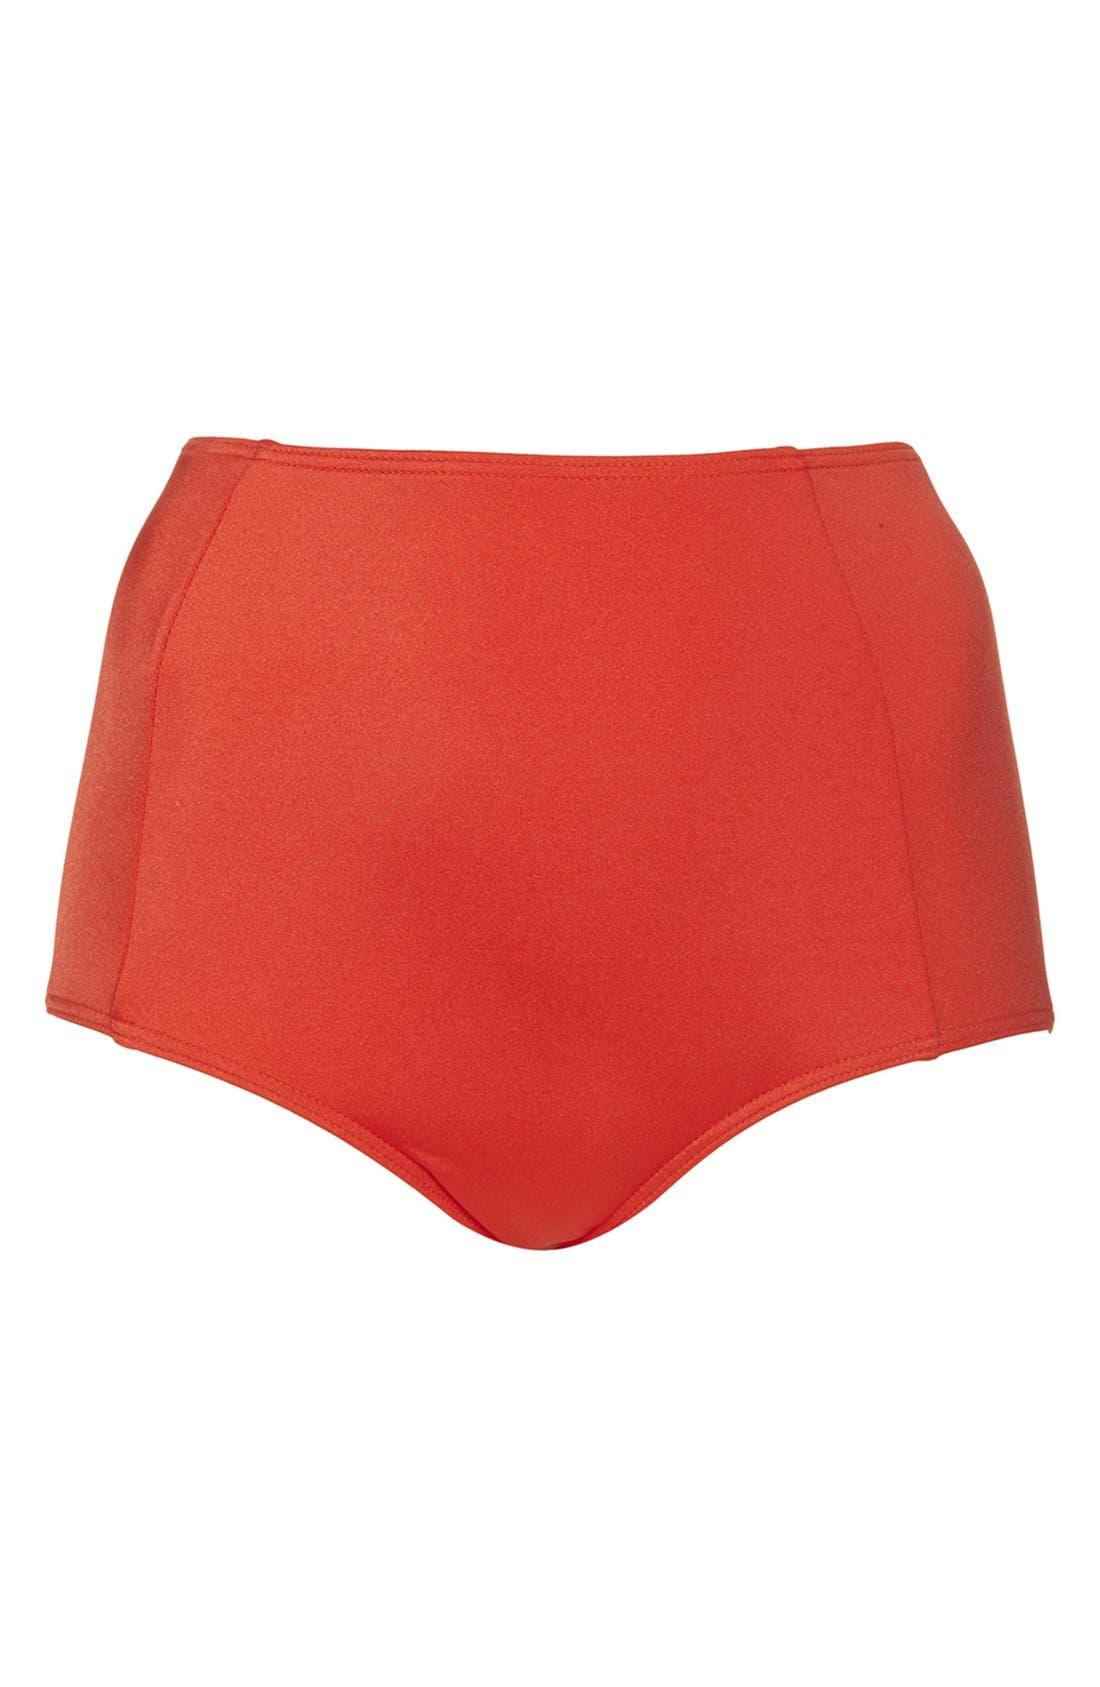 Main Image - Topshop High Rise Bikini Bottoms